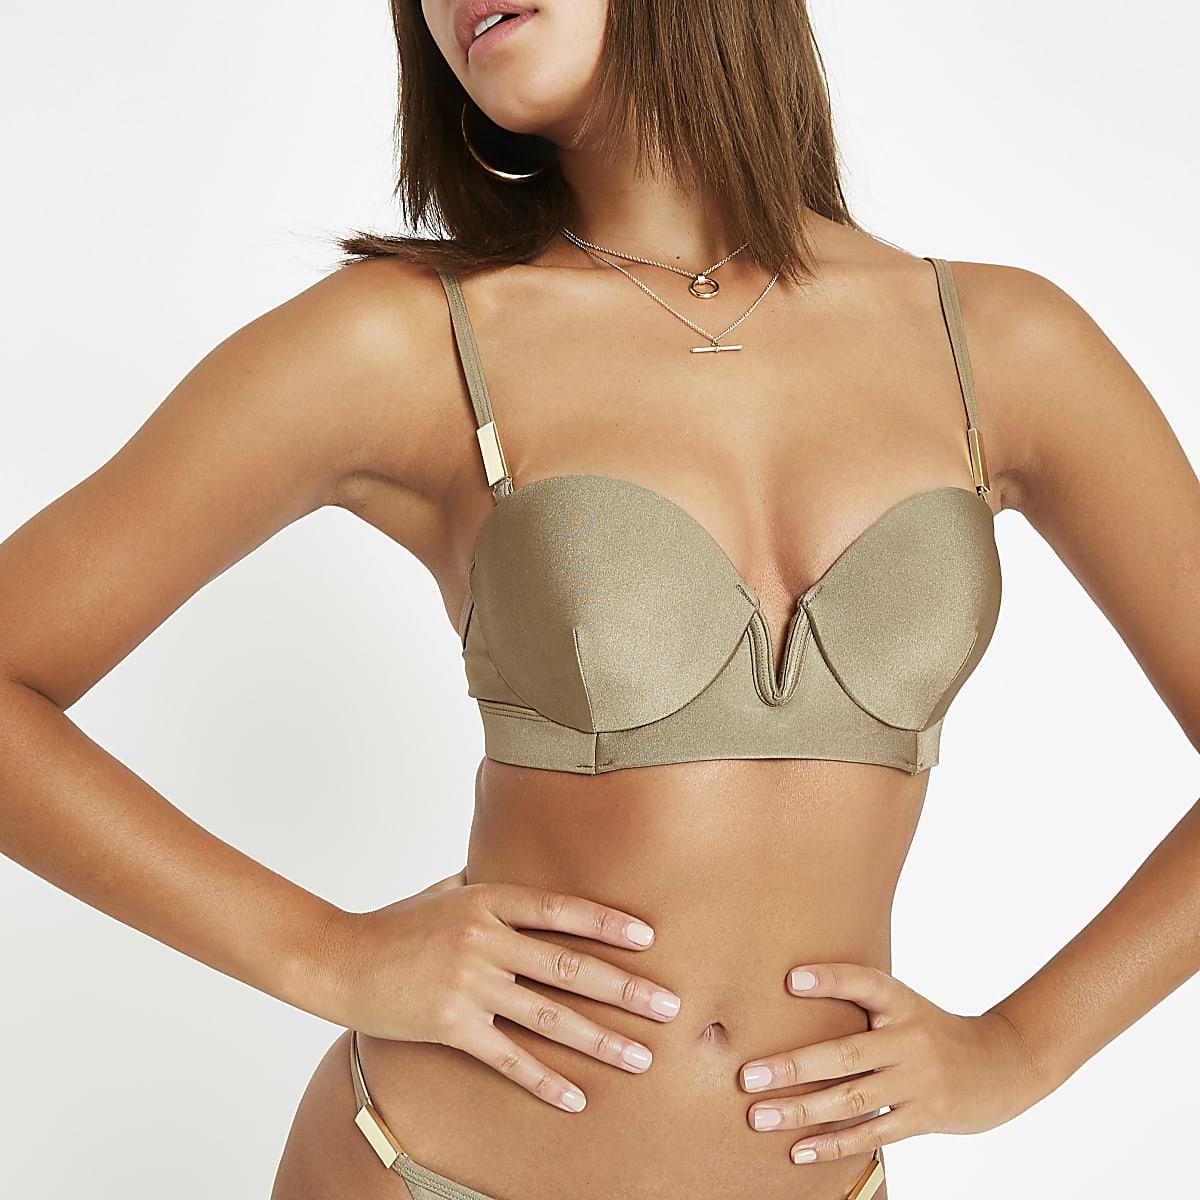 Kaki balconette bikinitop met V-beugel